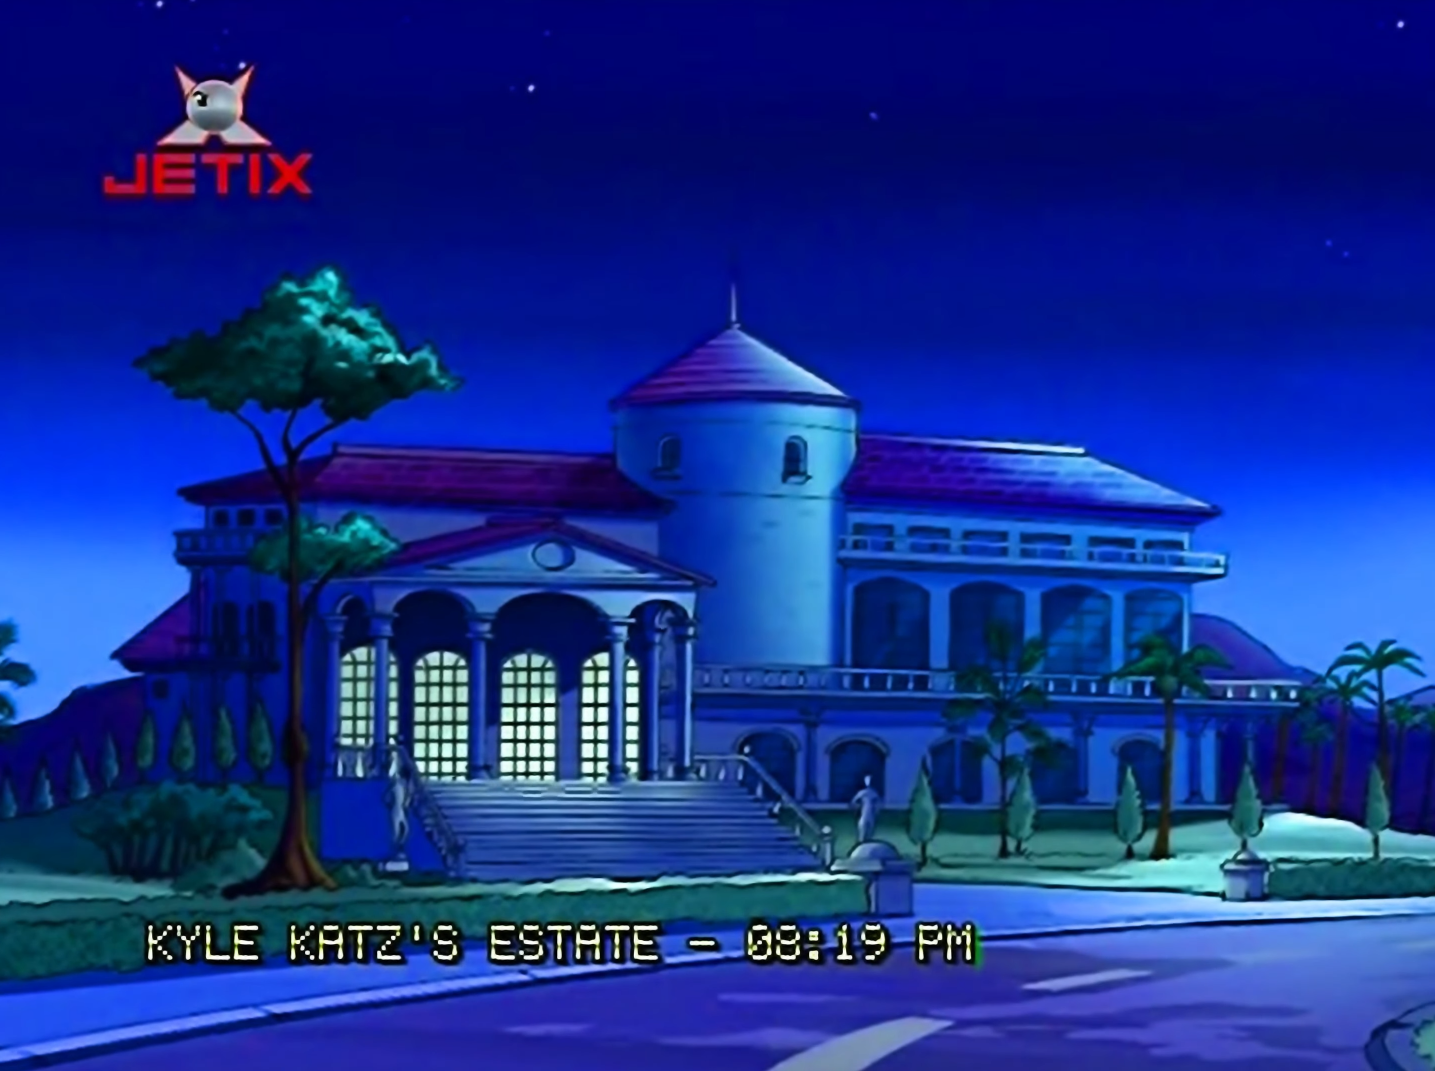 Arquivo:Kyle Katz's Estate.png